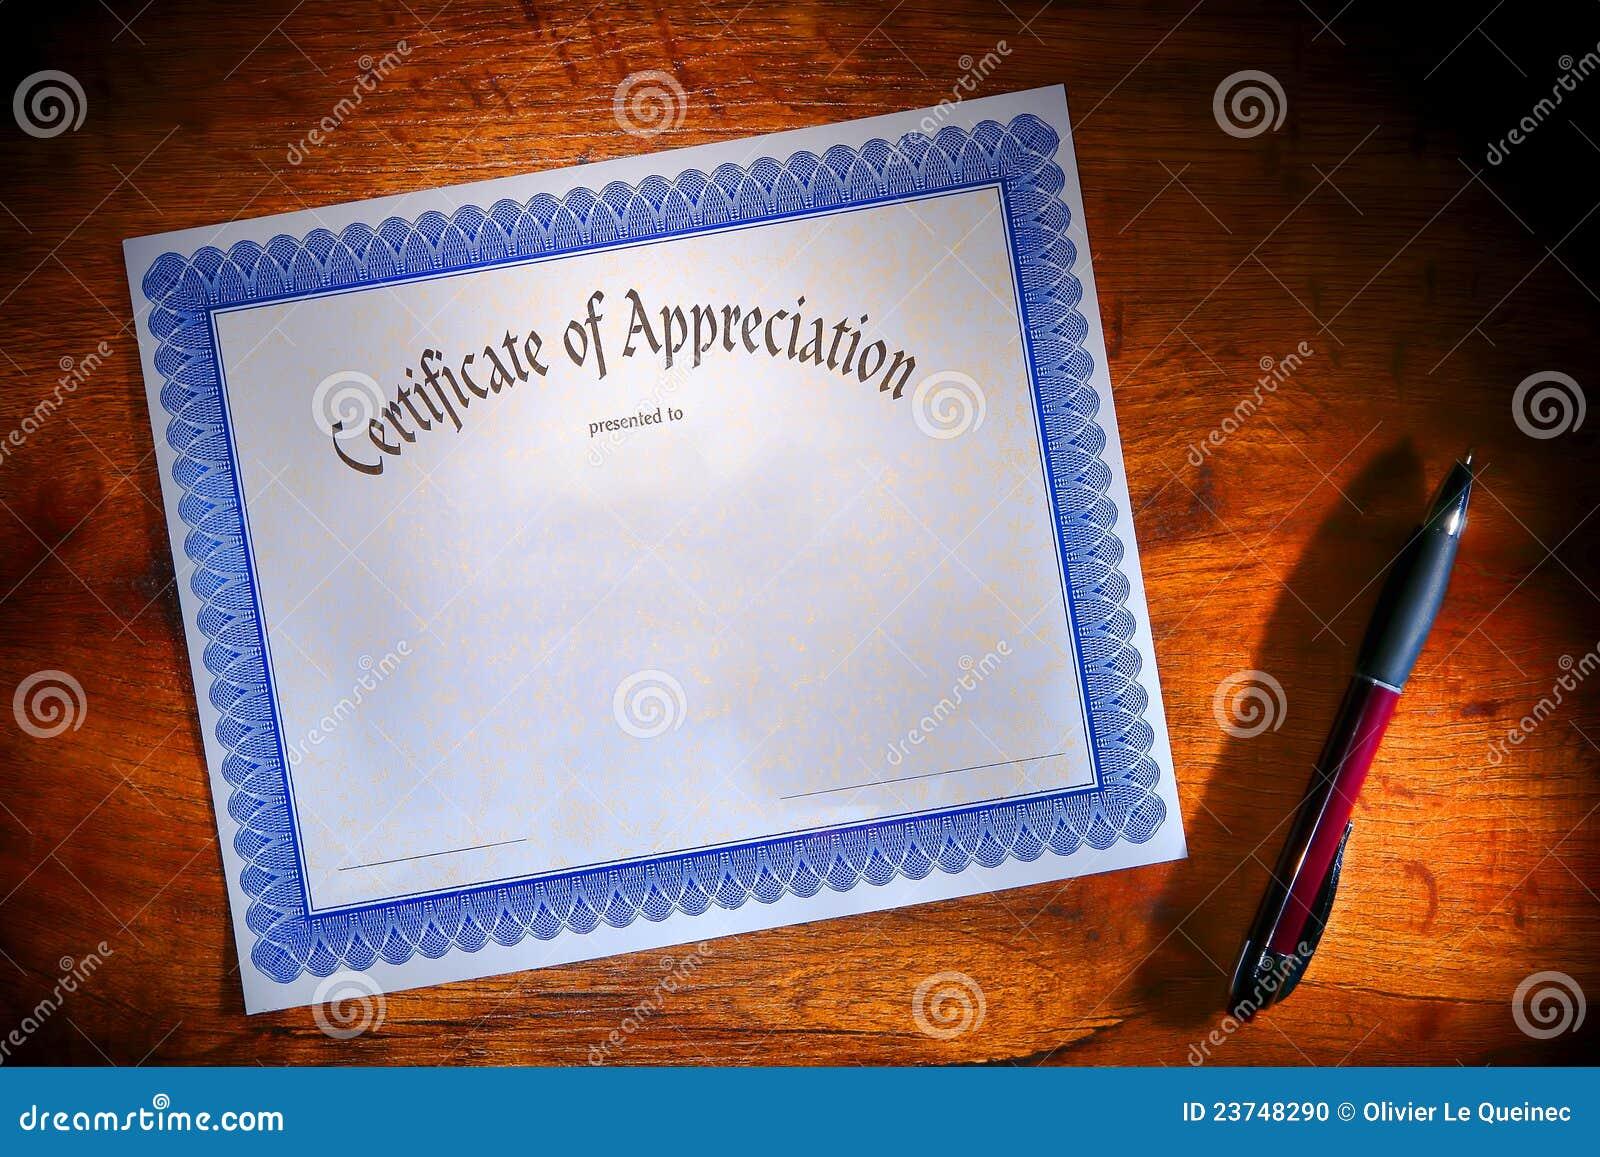 Certificate Of Appreciation Blank Document On Desk Stock